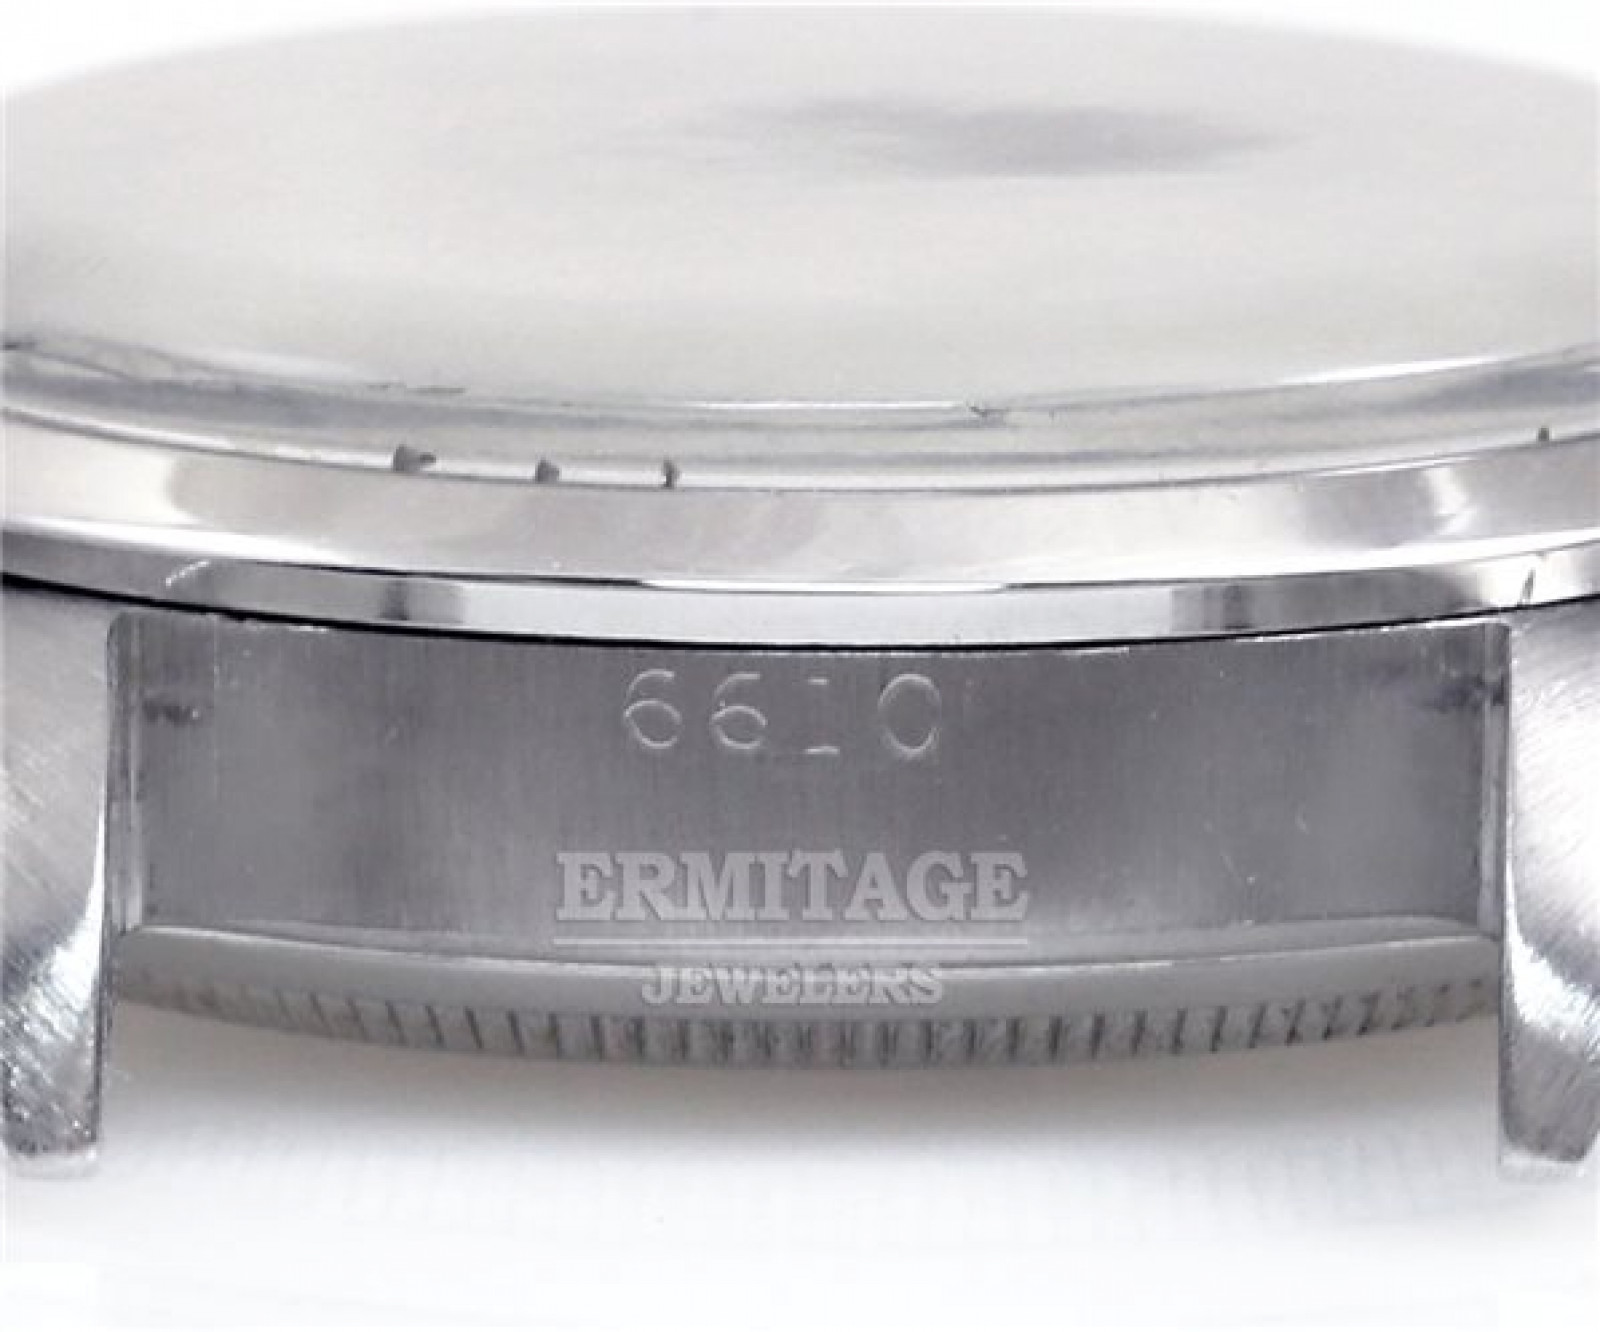 Vintage Rolex Explorer 6610